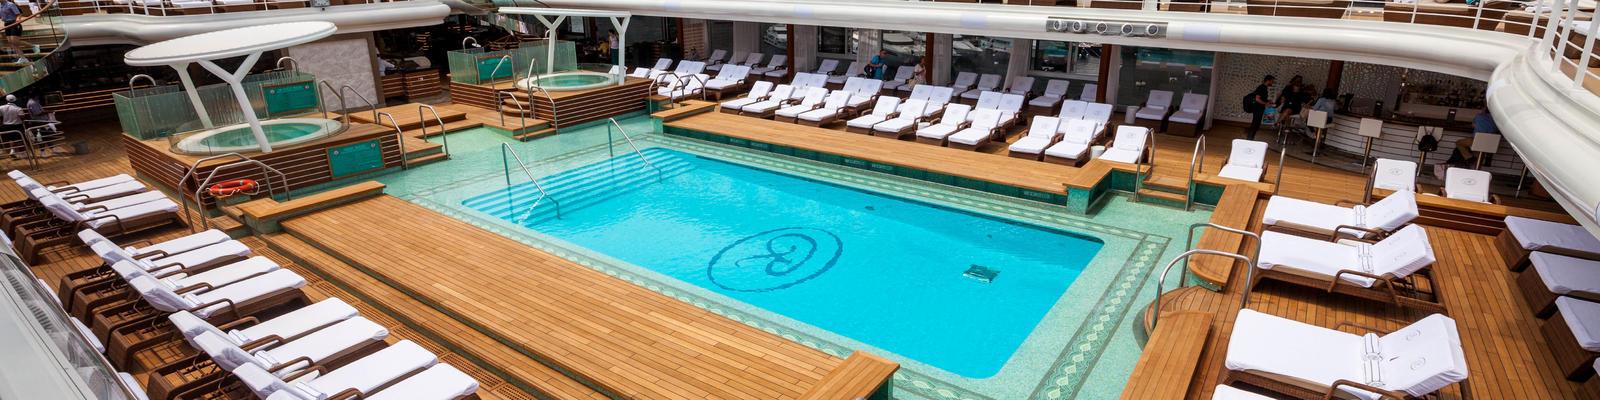 Pool Deck on Seven Seas Explorer (Photo: Cruise Critic)